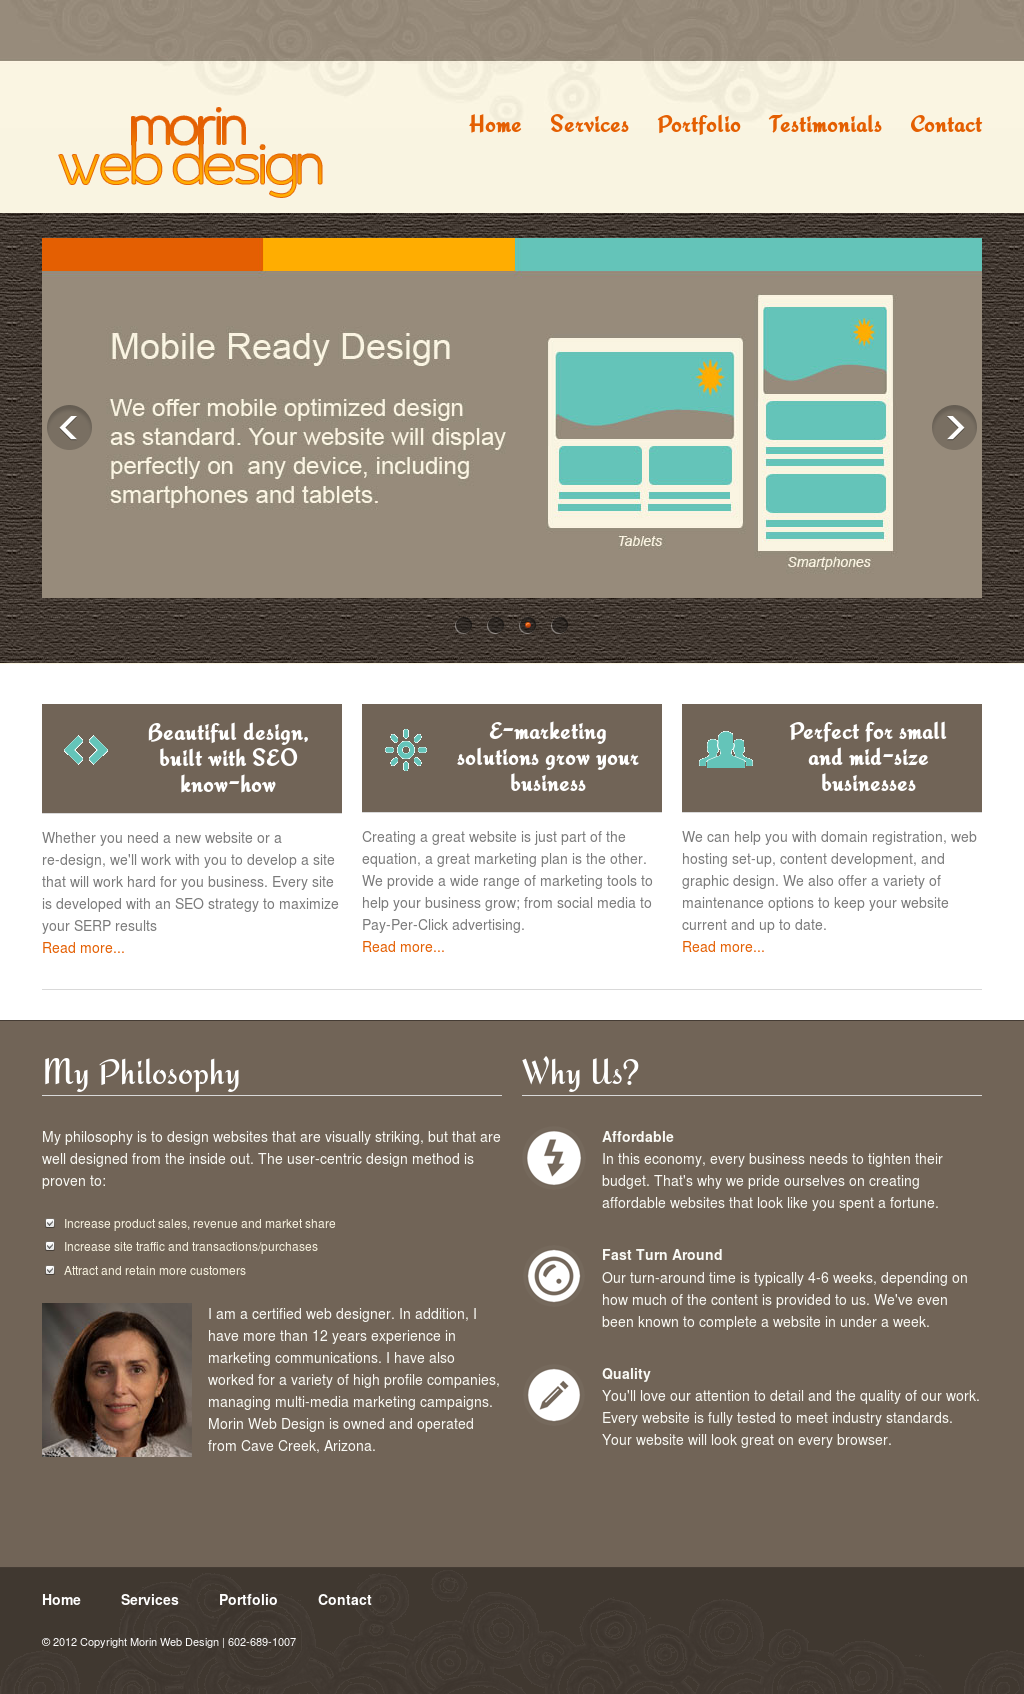 Morin Web Design Competitors, Revenue and Employees - Owler Company